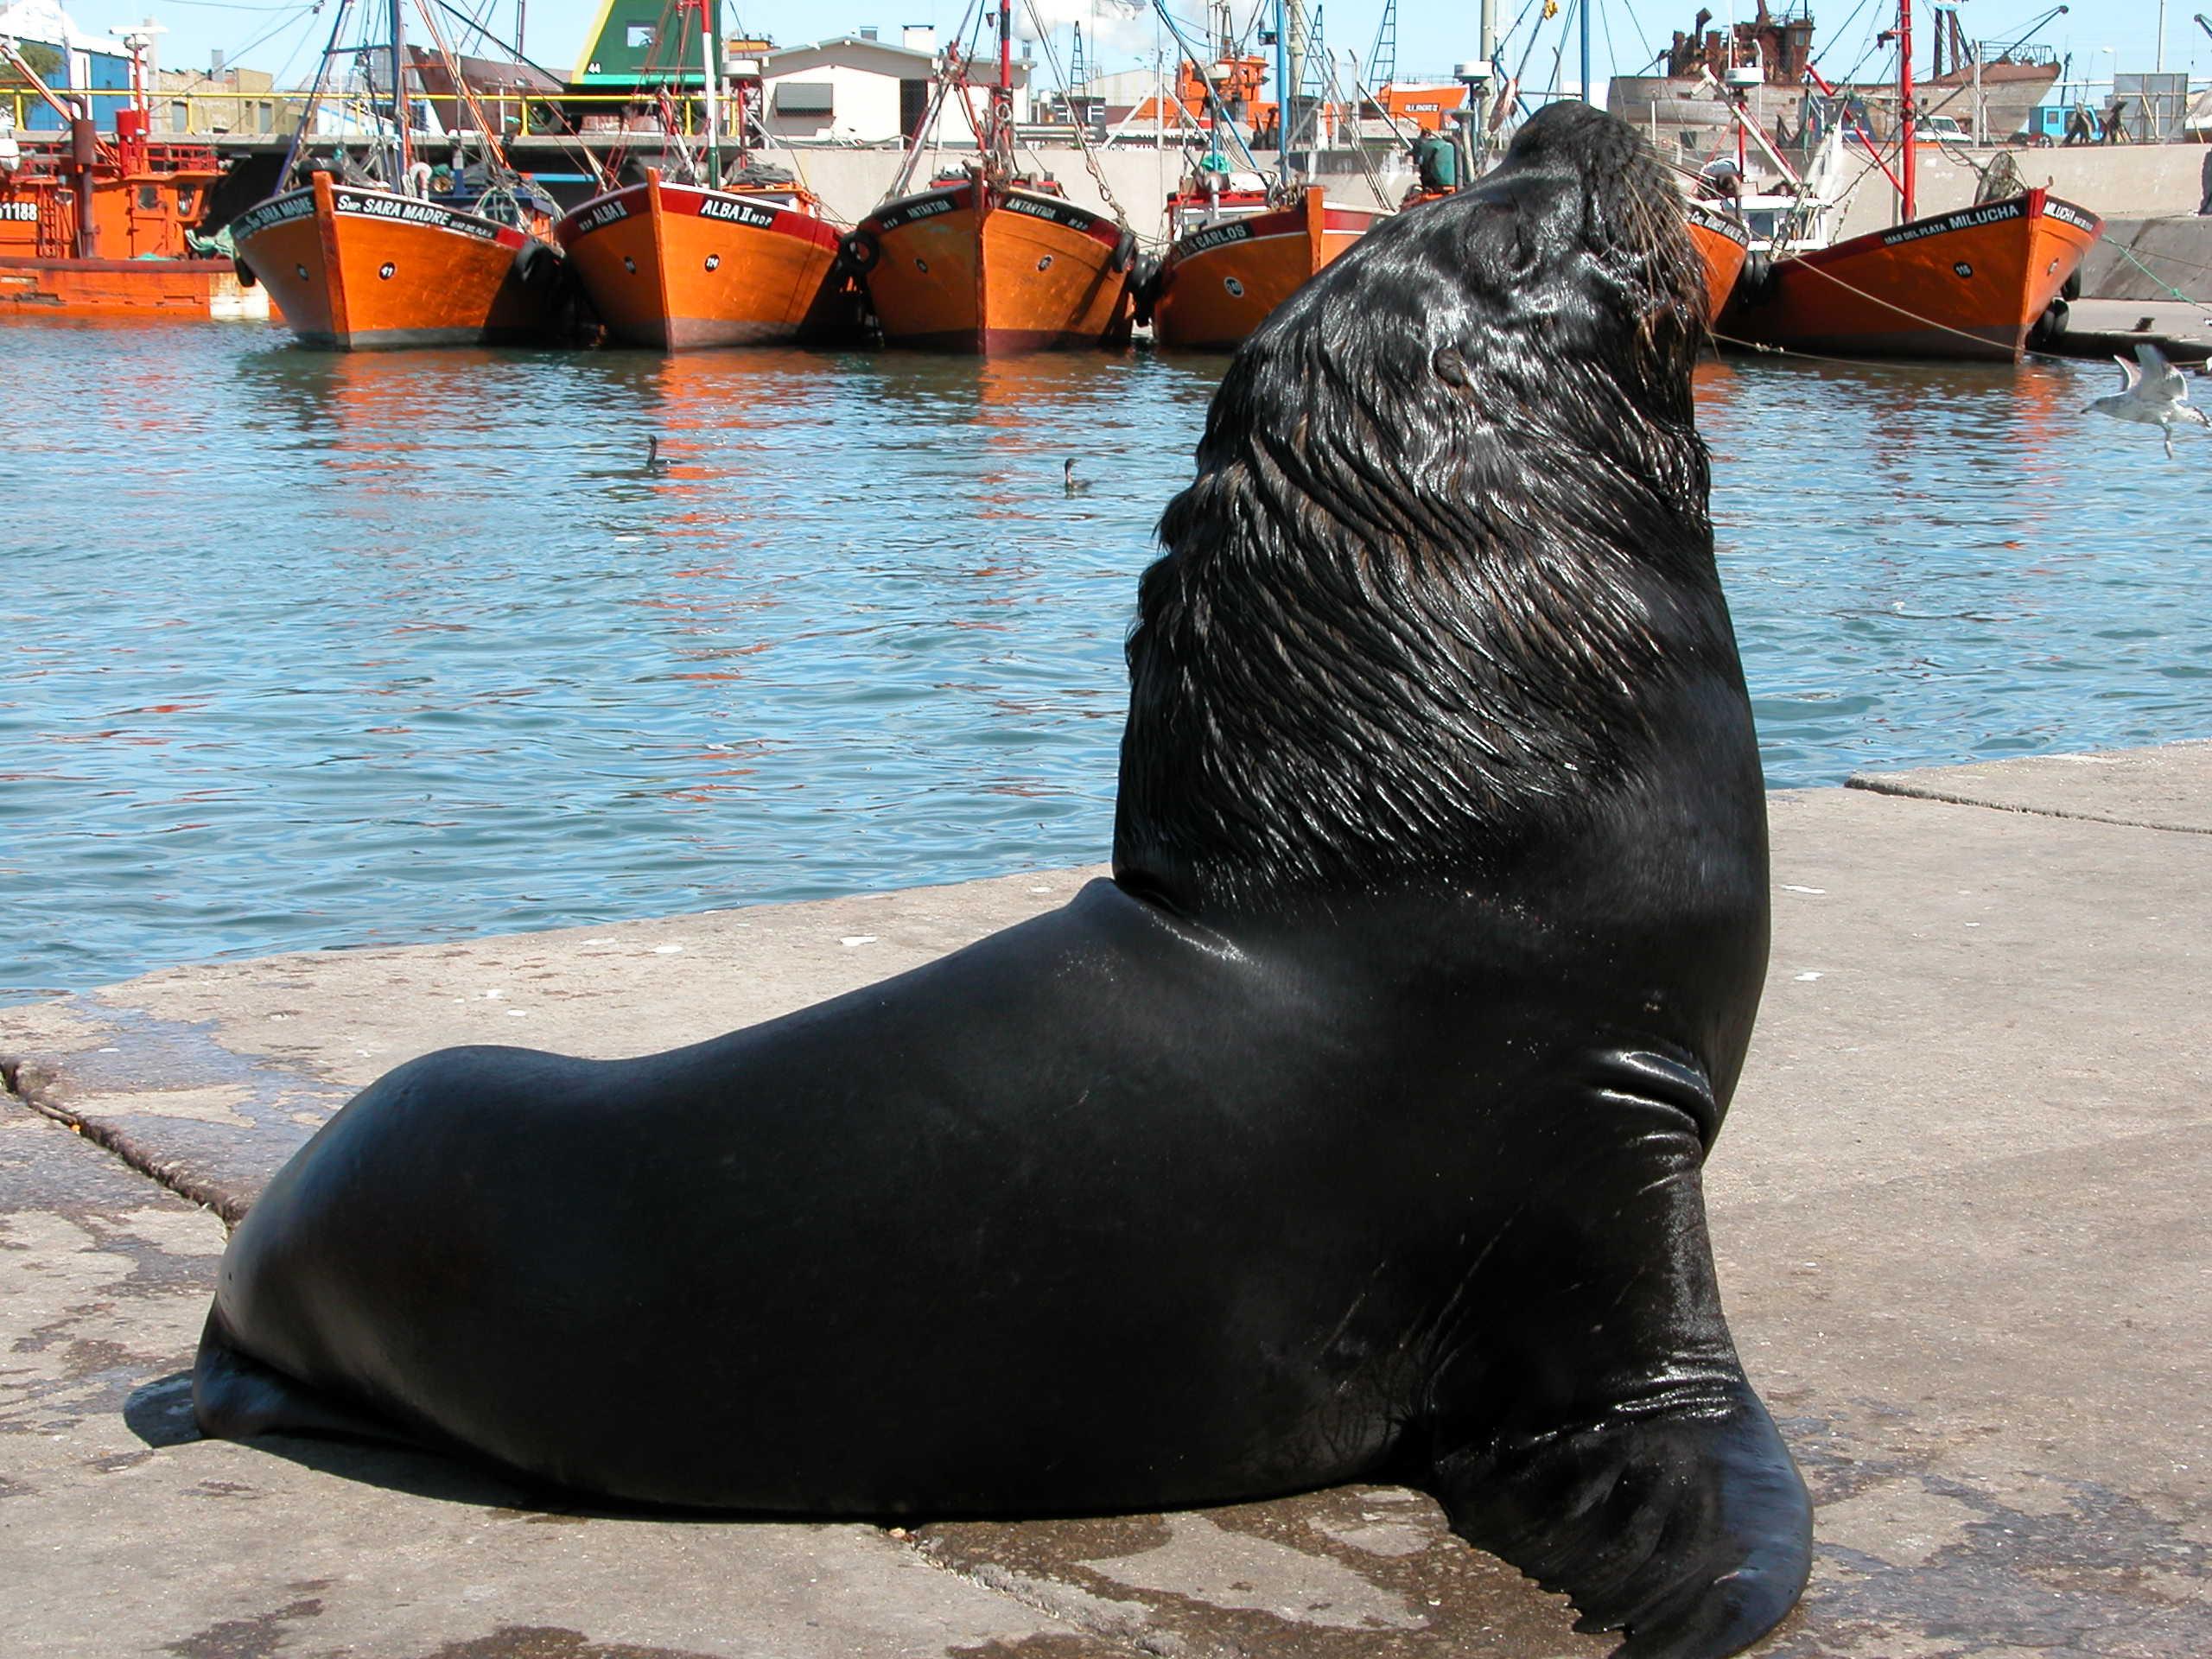 Mar del Plata: liberan hoy a cinco lobos marinos